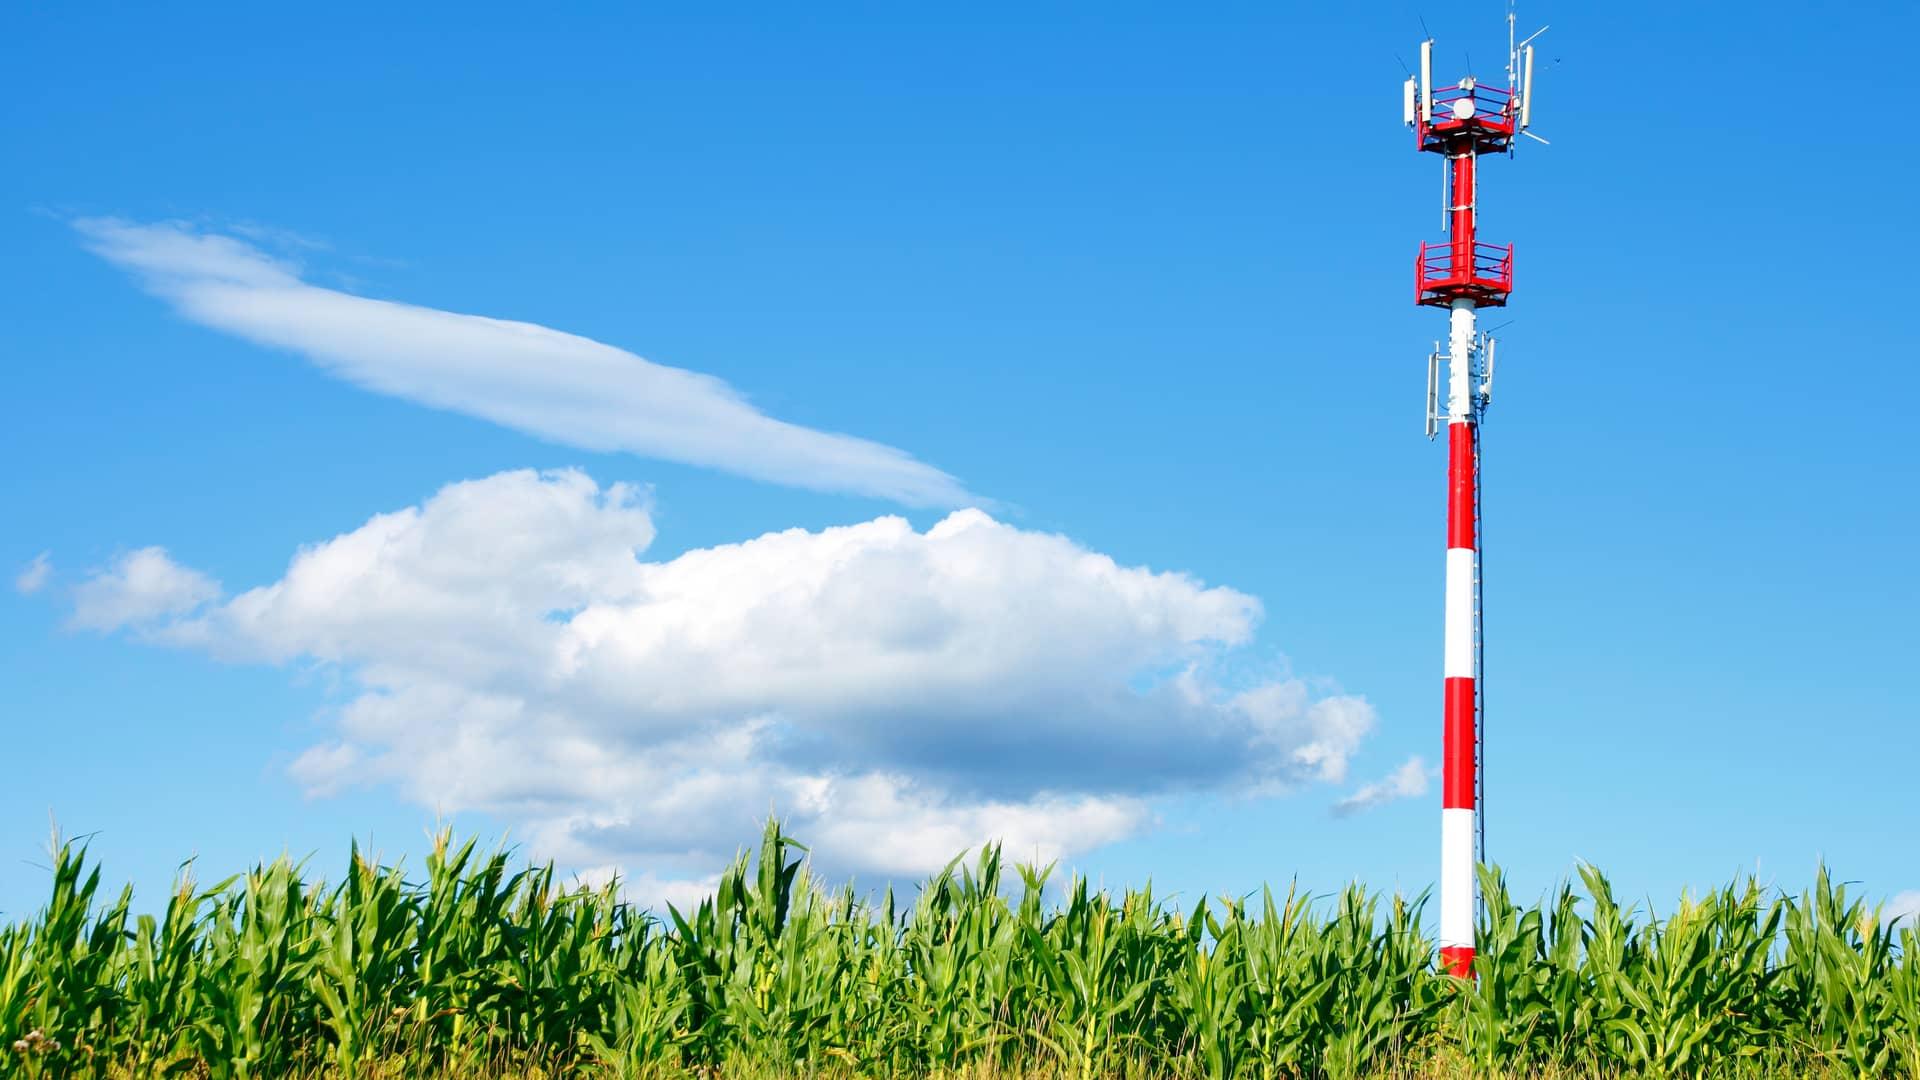 Antena de cobertua en mitad de campo de maiz simboliza cobertura virgin telco